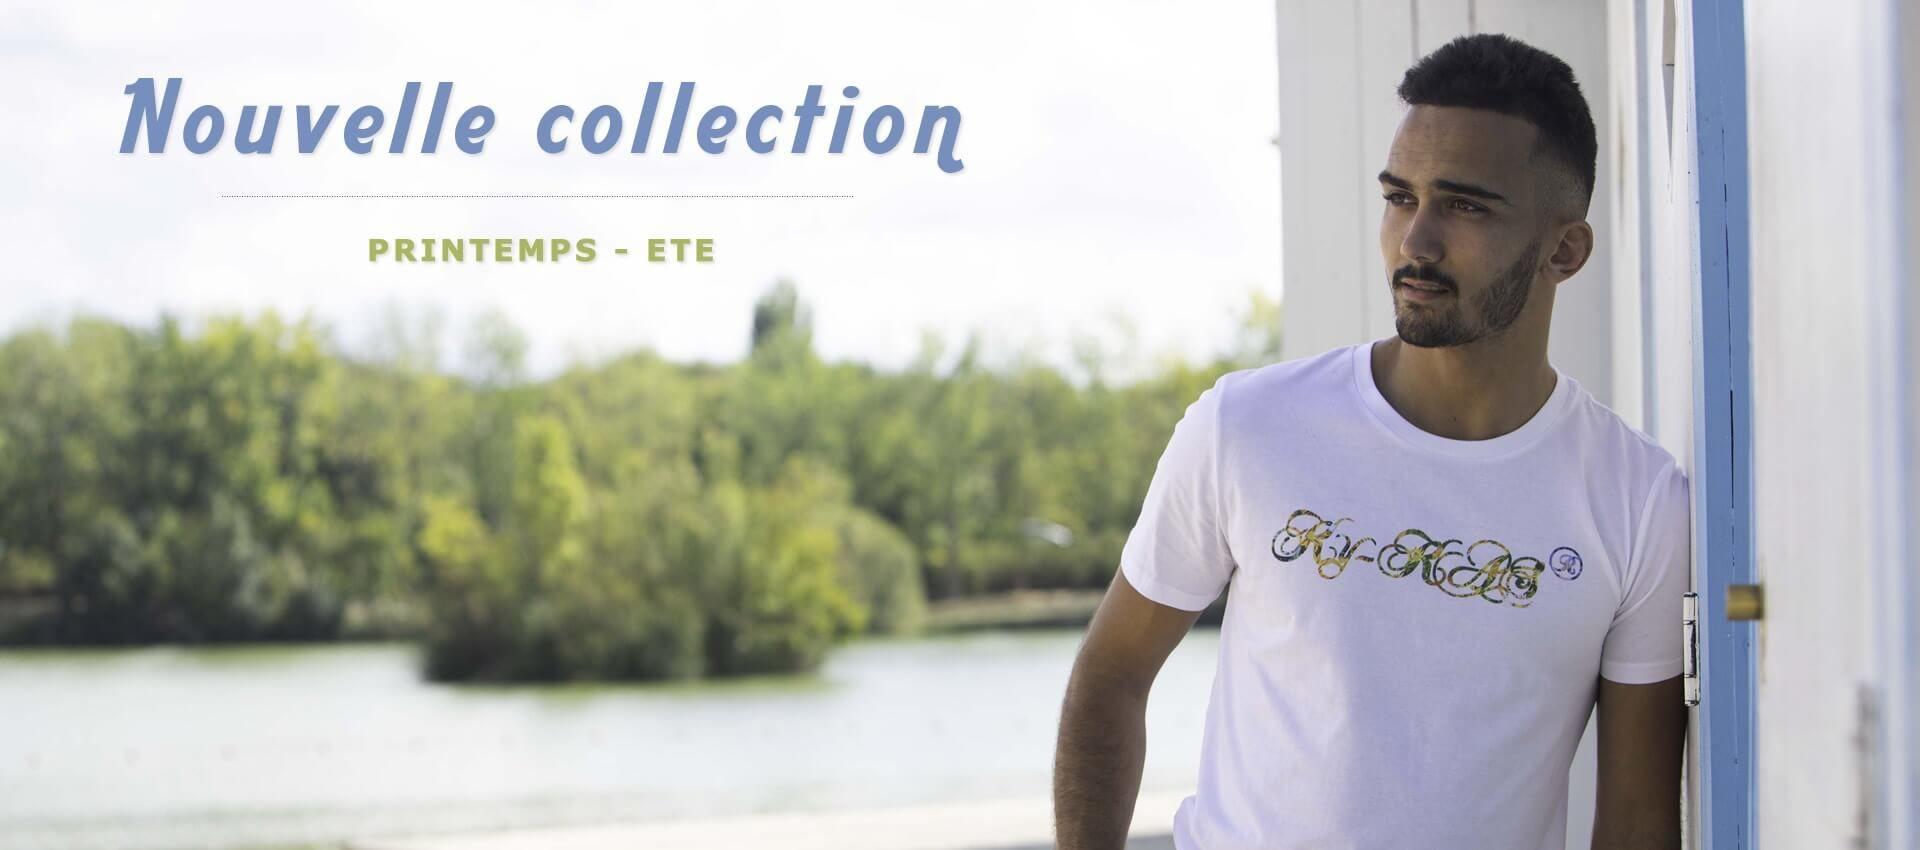 Vêtements bio coton sportswear streetwear rap élégant urban skate surf hommes femmes